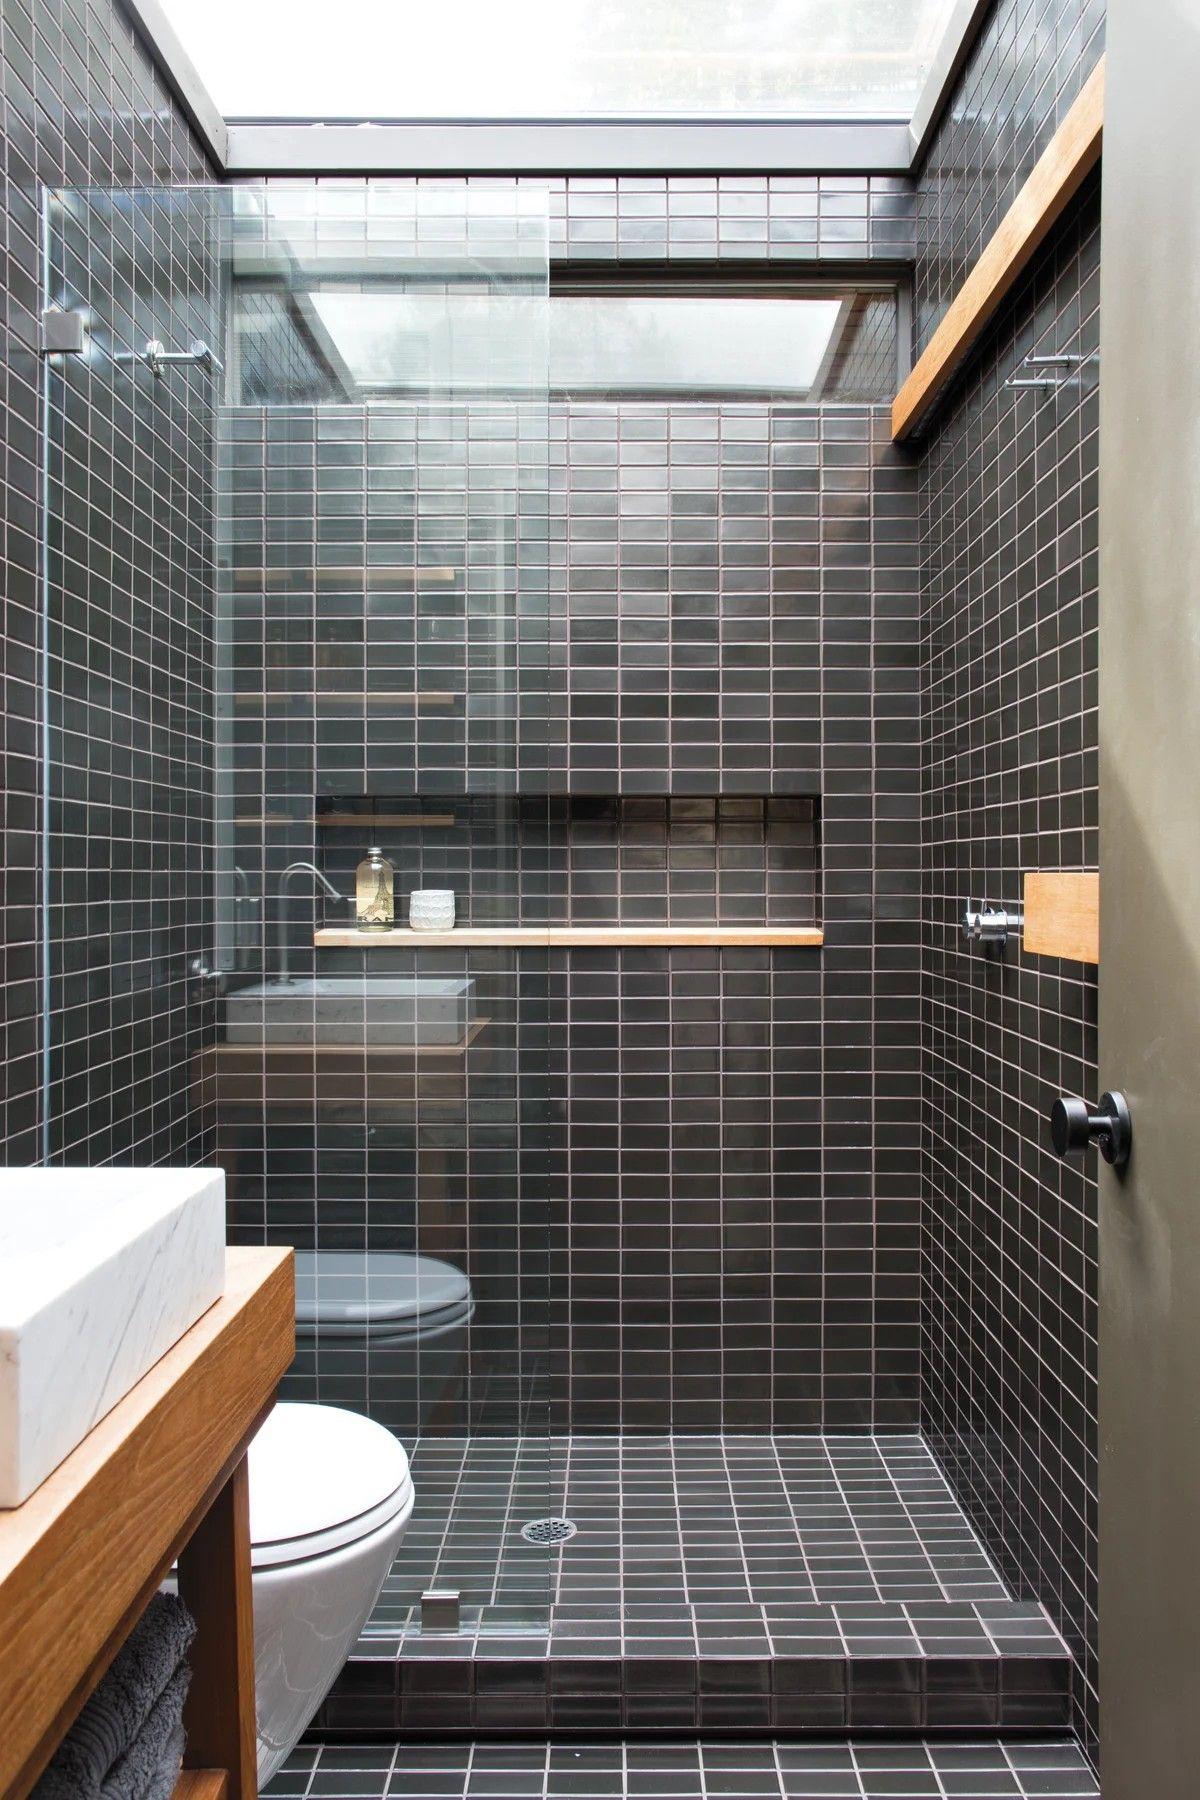 Pin By Juan Luis On Walk This Way In 2020 Black Tile Bathrooms Best Bathroom Tiles Bathroom Tile Designs